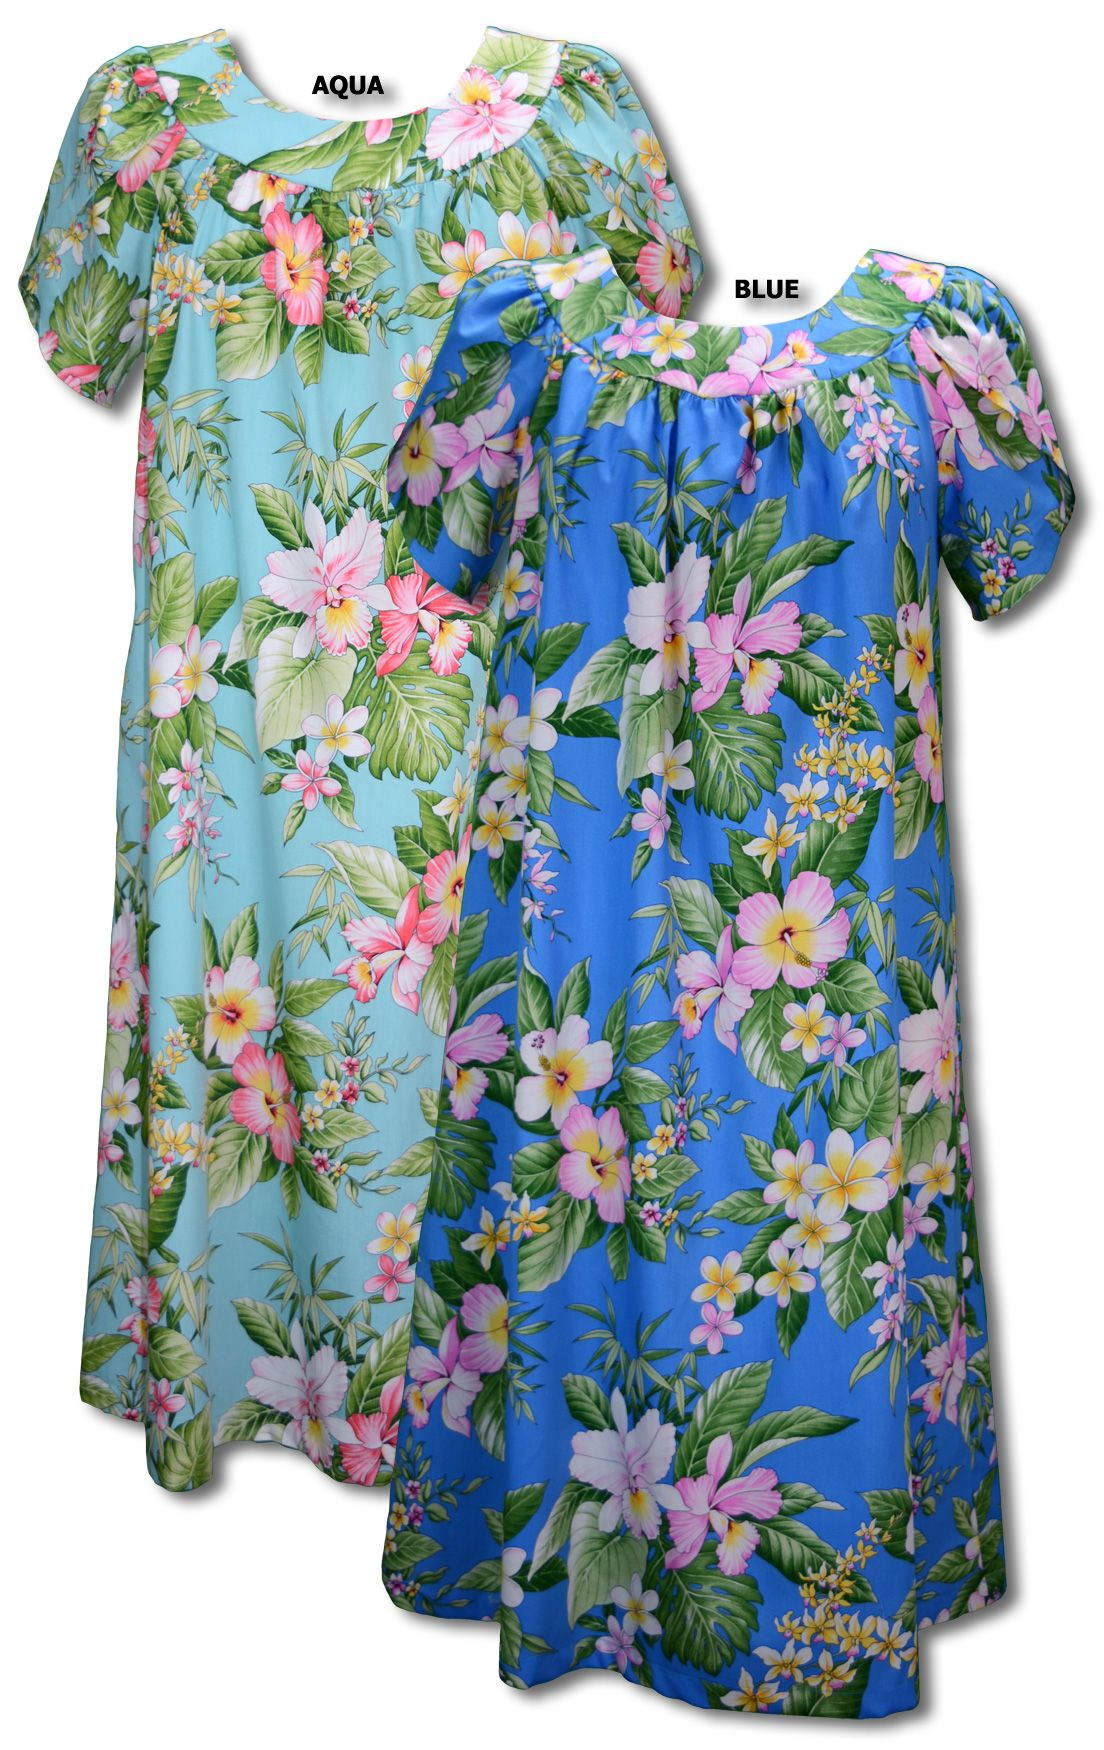 110466bead3a Tea Length · Ankle Length · Hibiscus Plumeria Orchid Hawaiian MuuMuu,  (Kaftan / Caftan), Pull-Over House